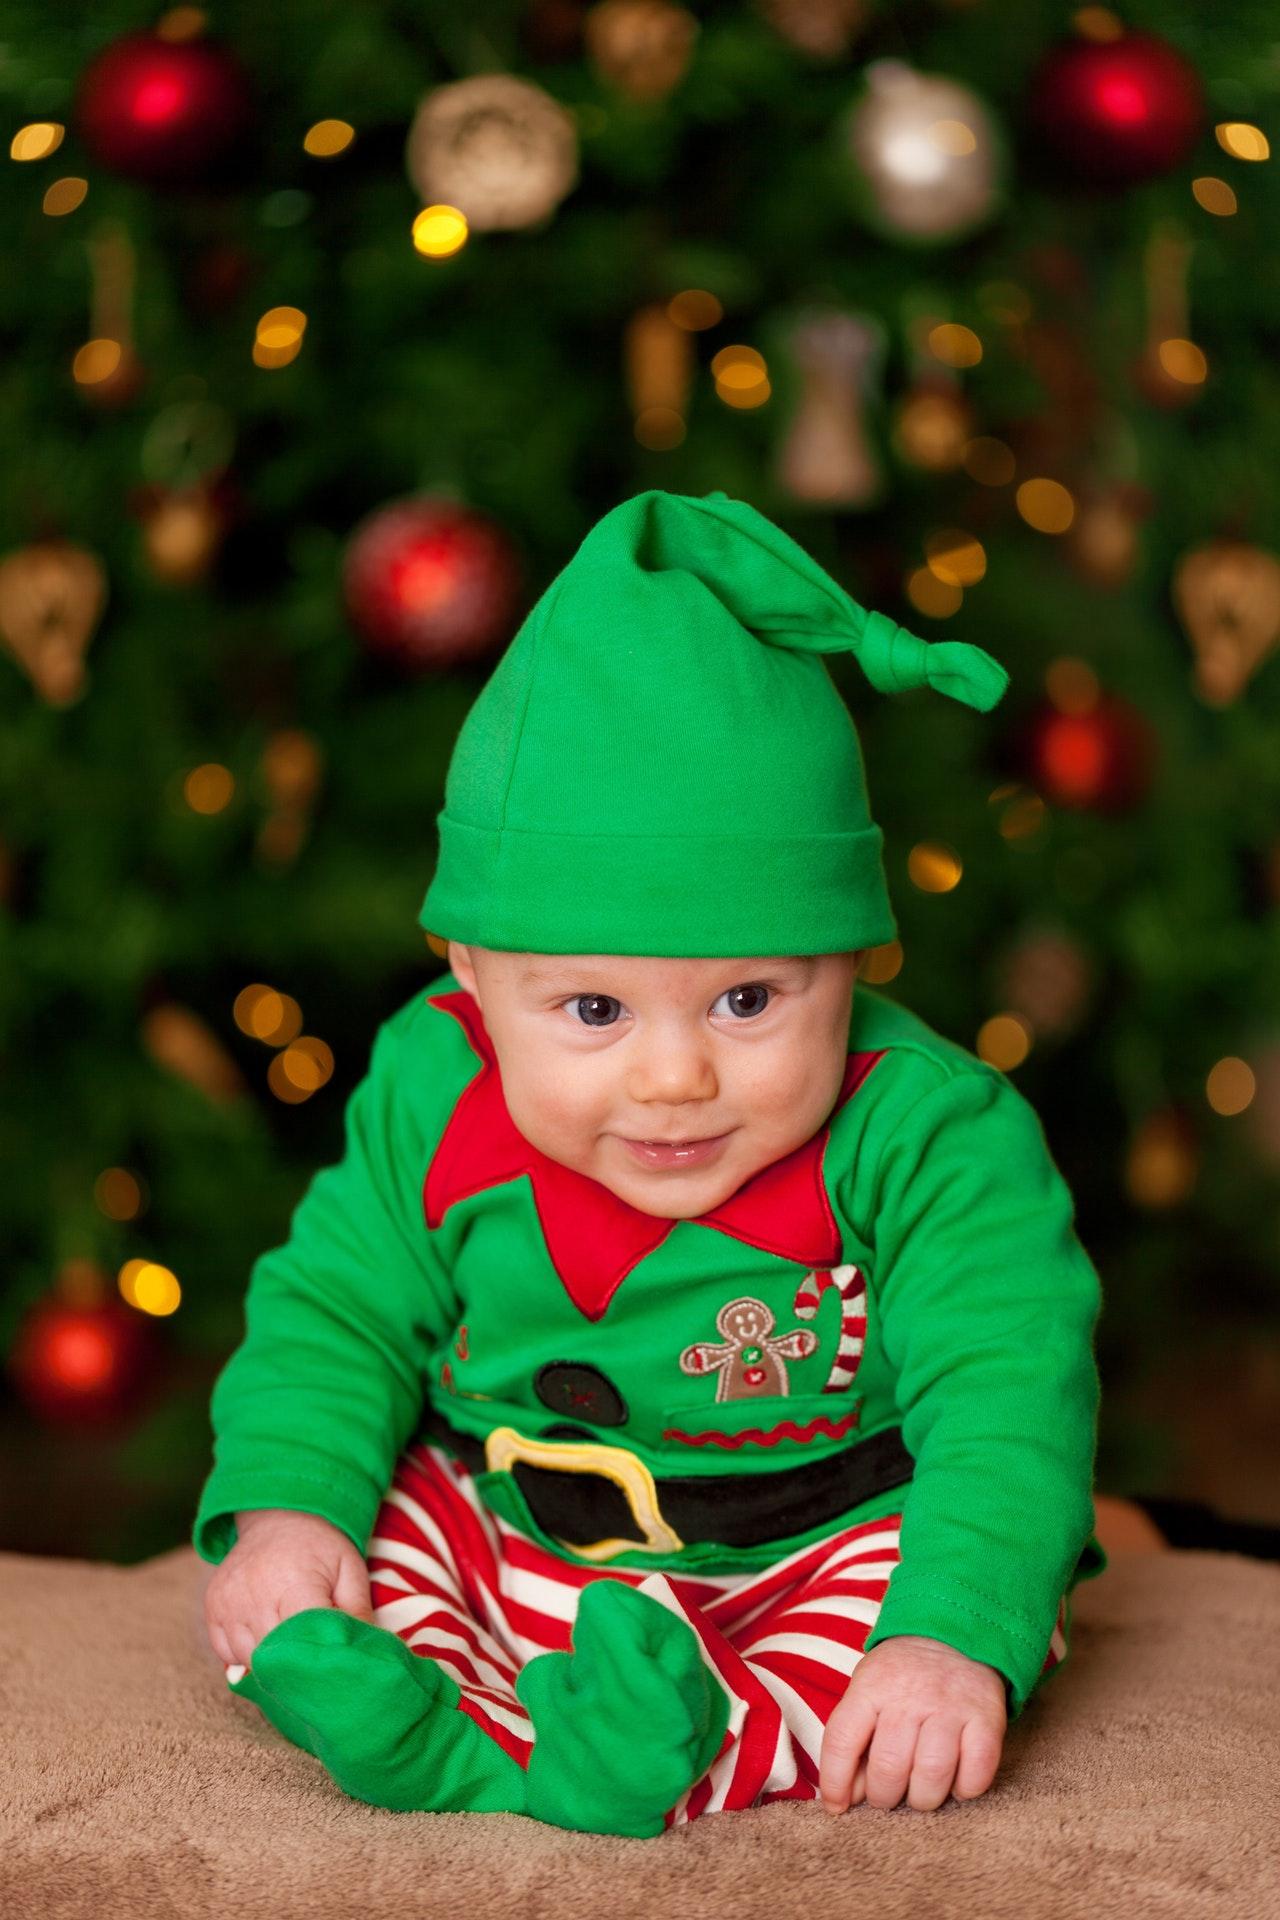 baby-boy-child-christmas-41173.jpg